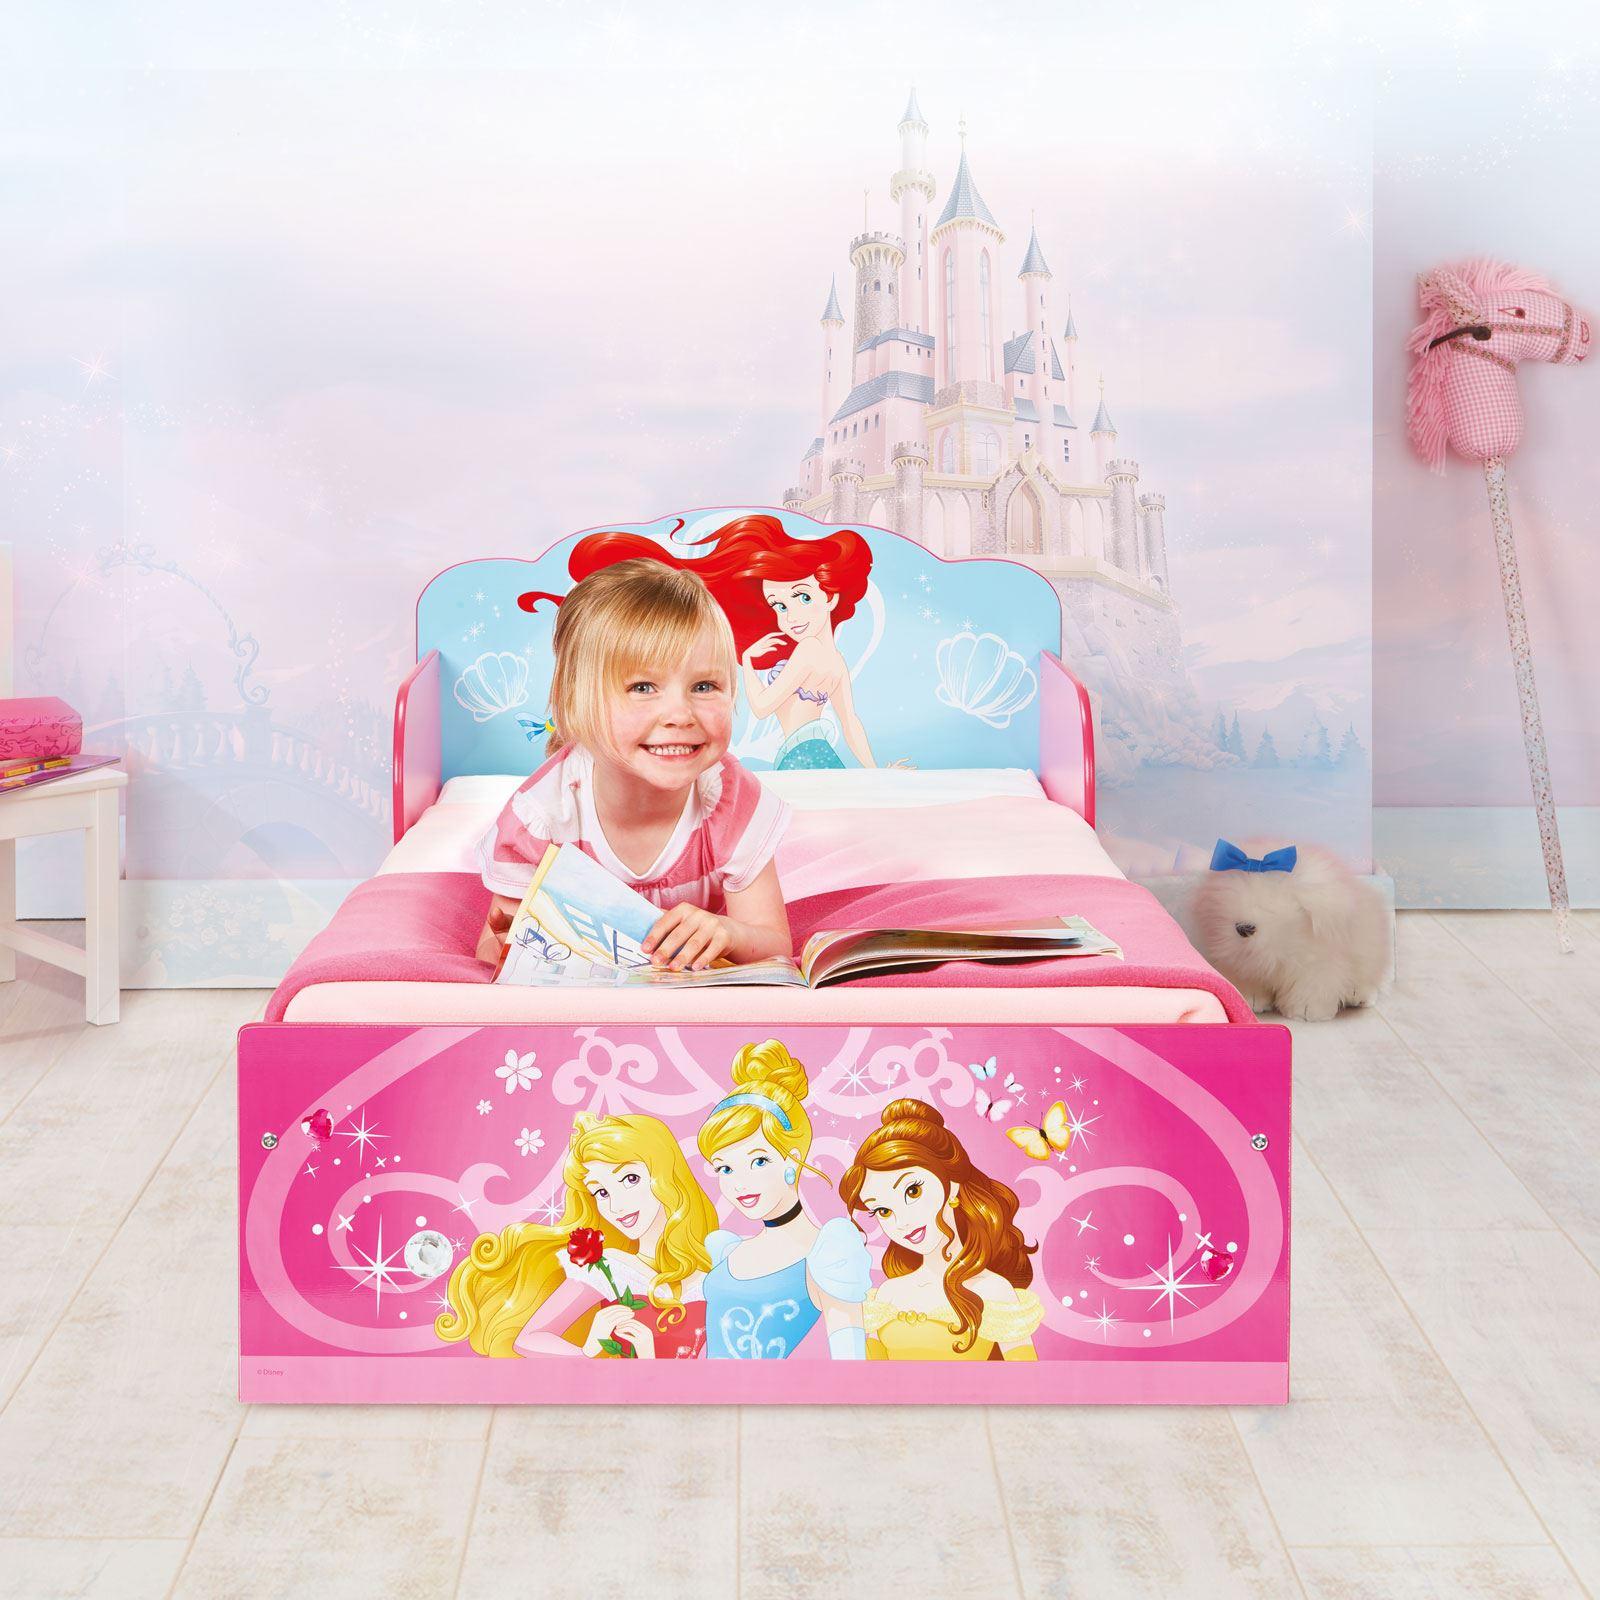 miniatura 15 - KIDS CHARACTER TODDLER BEDS - BOYS GIRLS BEDROOM DISNEY